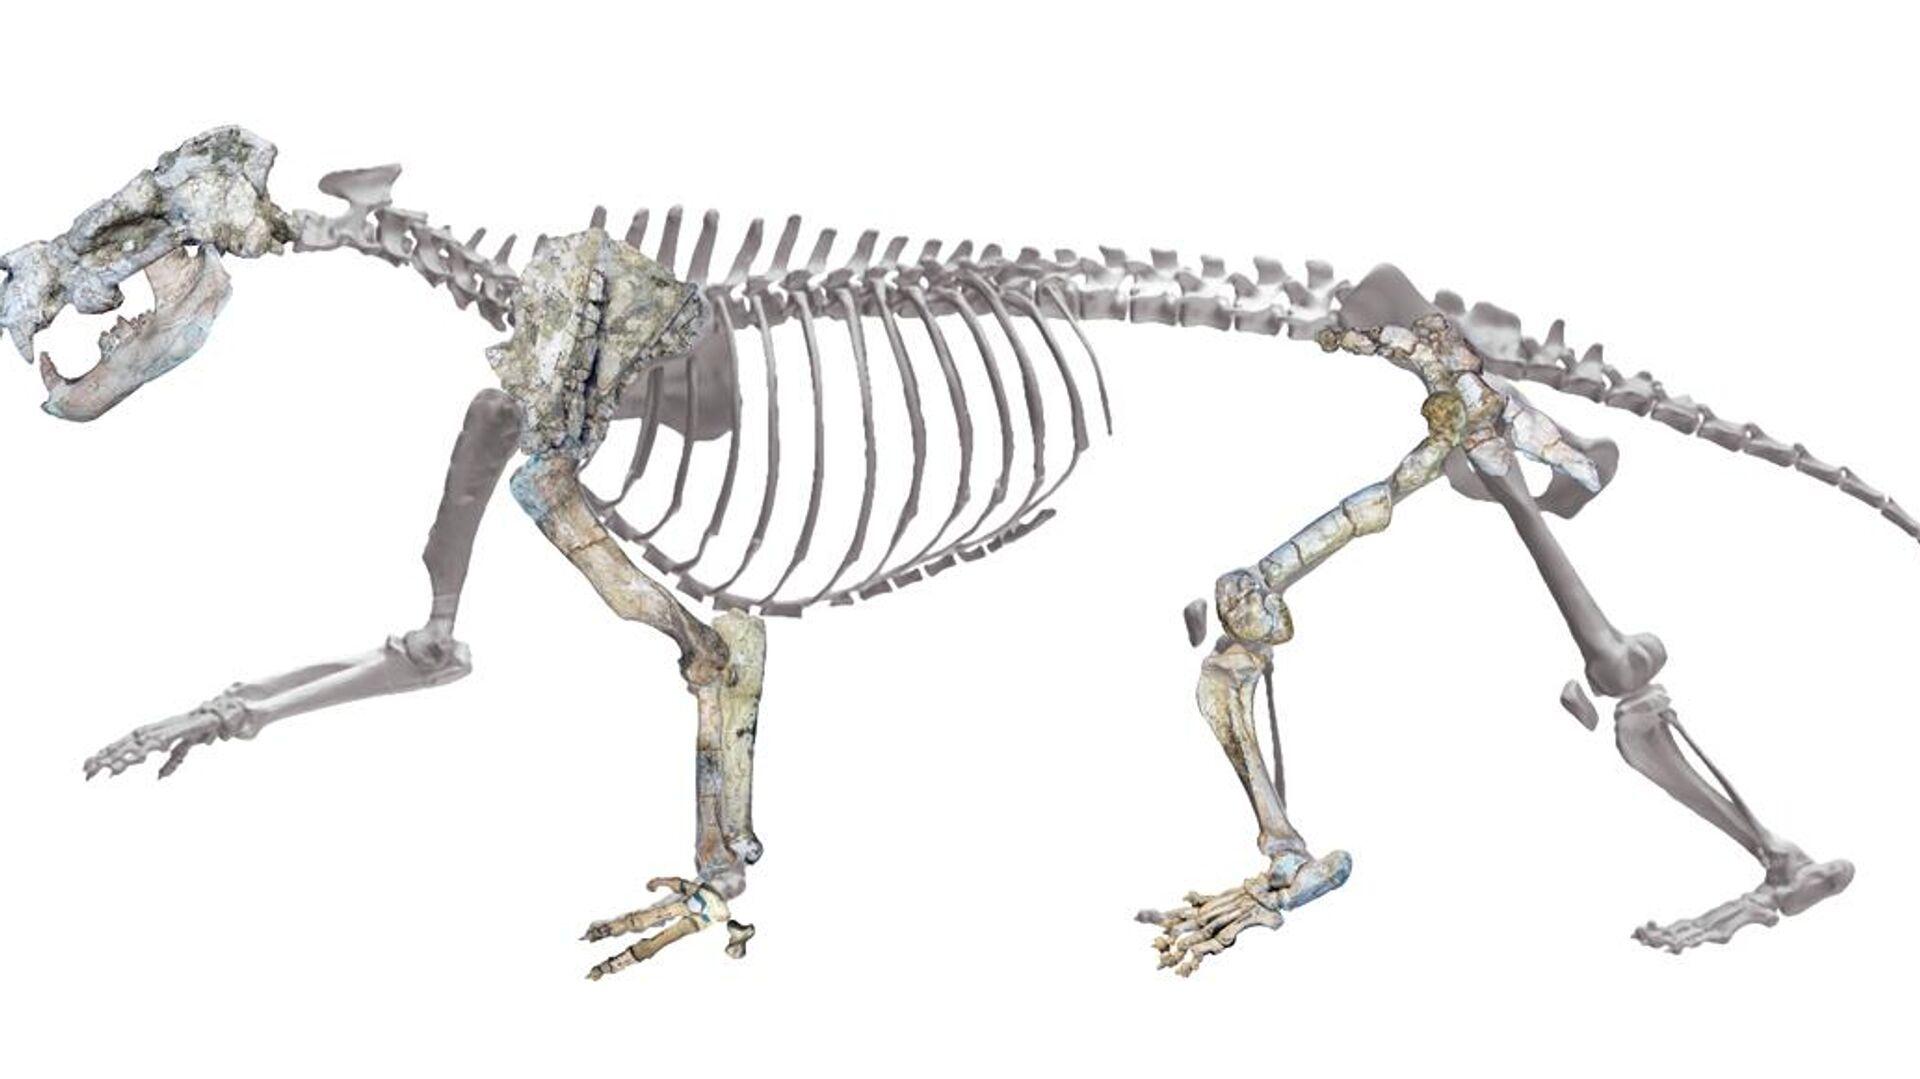 Esqueleto del  'Ammitocyon kainos' - Sputnik Mundo, 1920, 03.06.2021